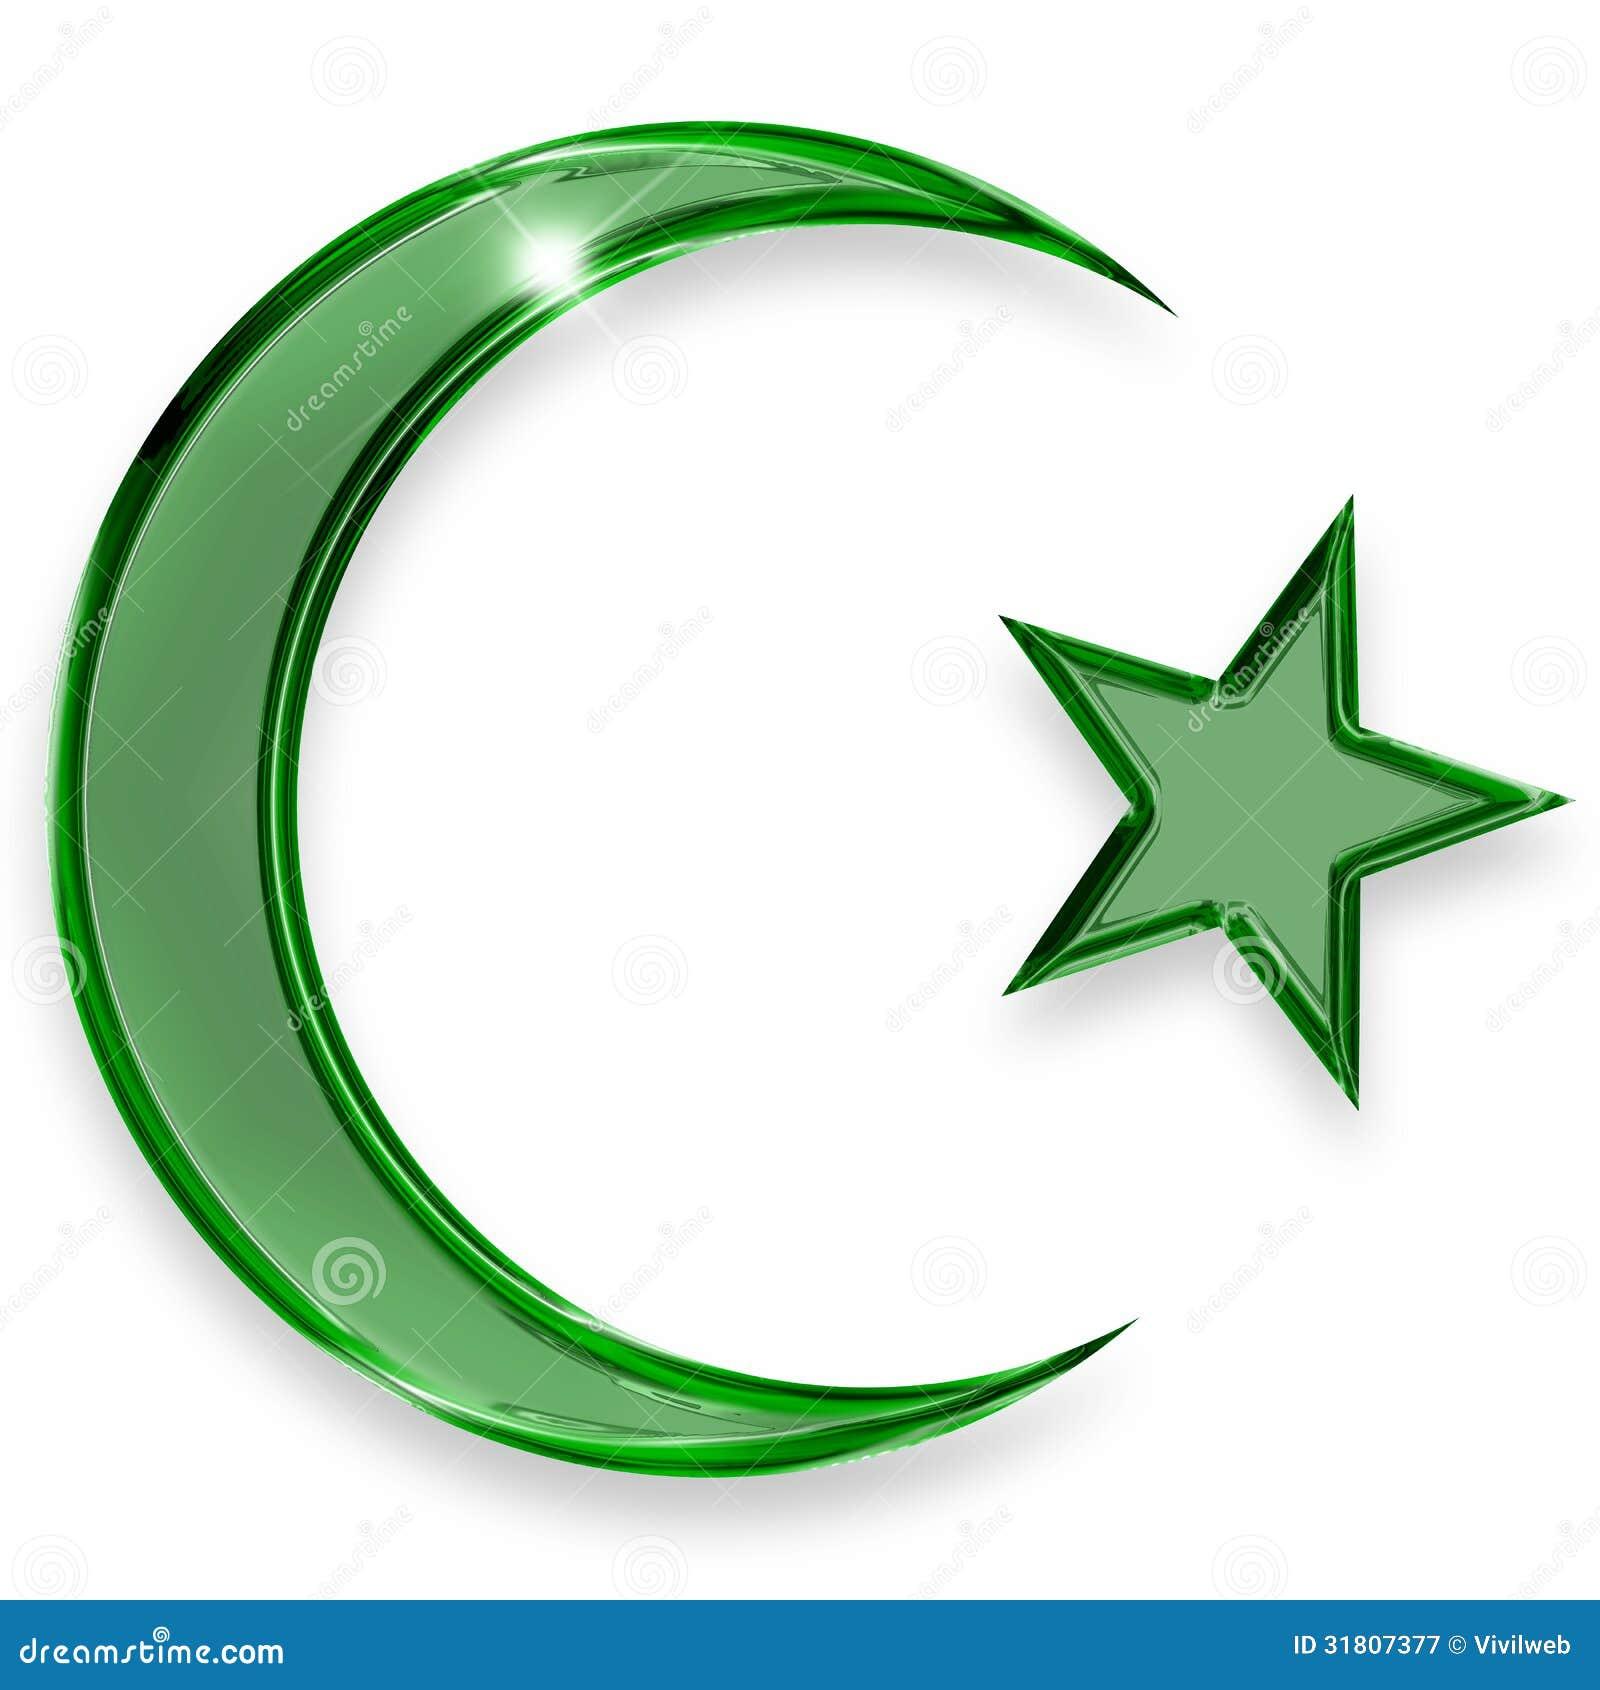 Emblem Of Islam Royalty Free Stock Photography Image